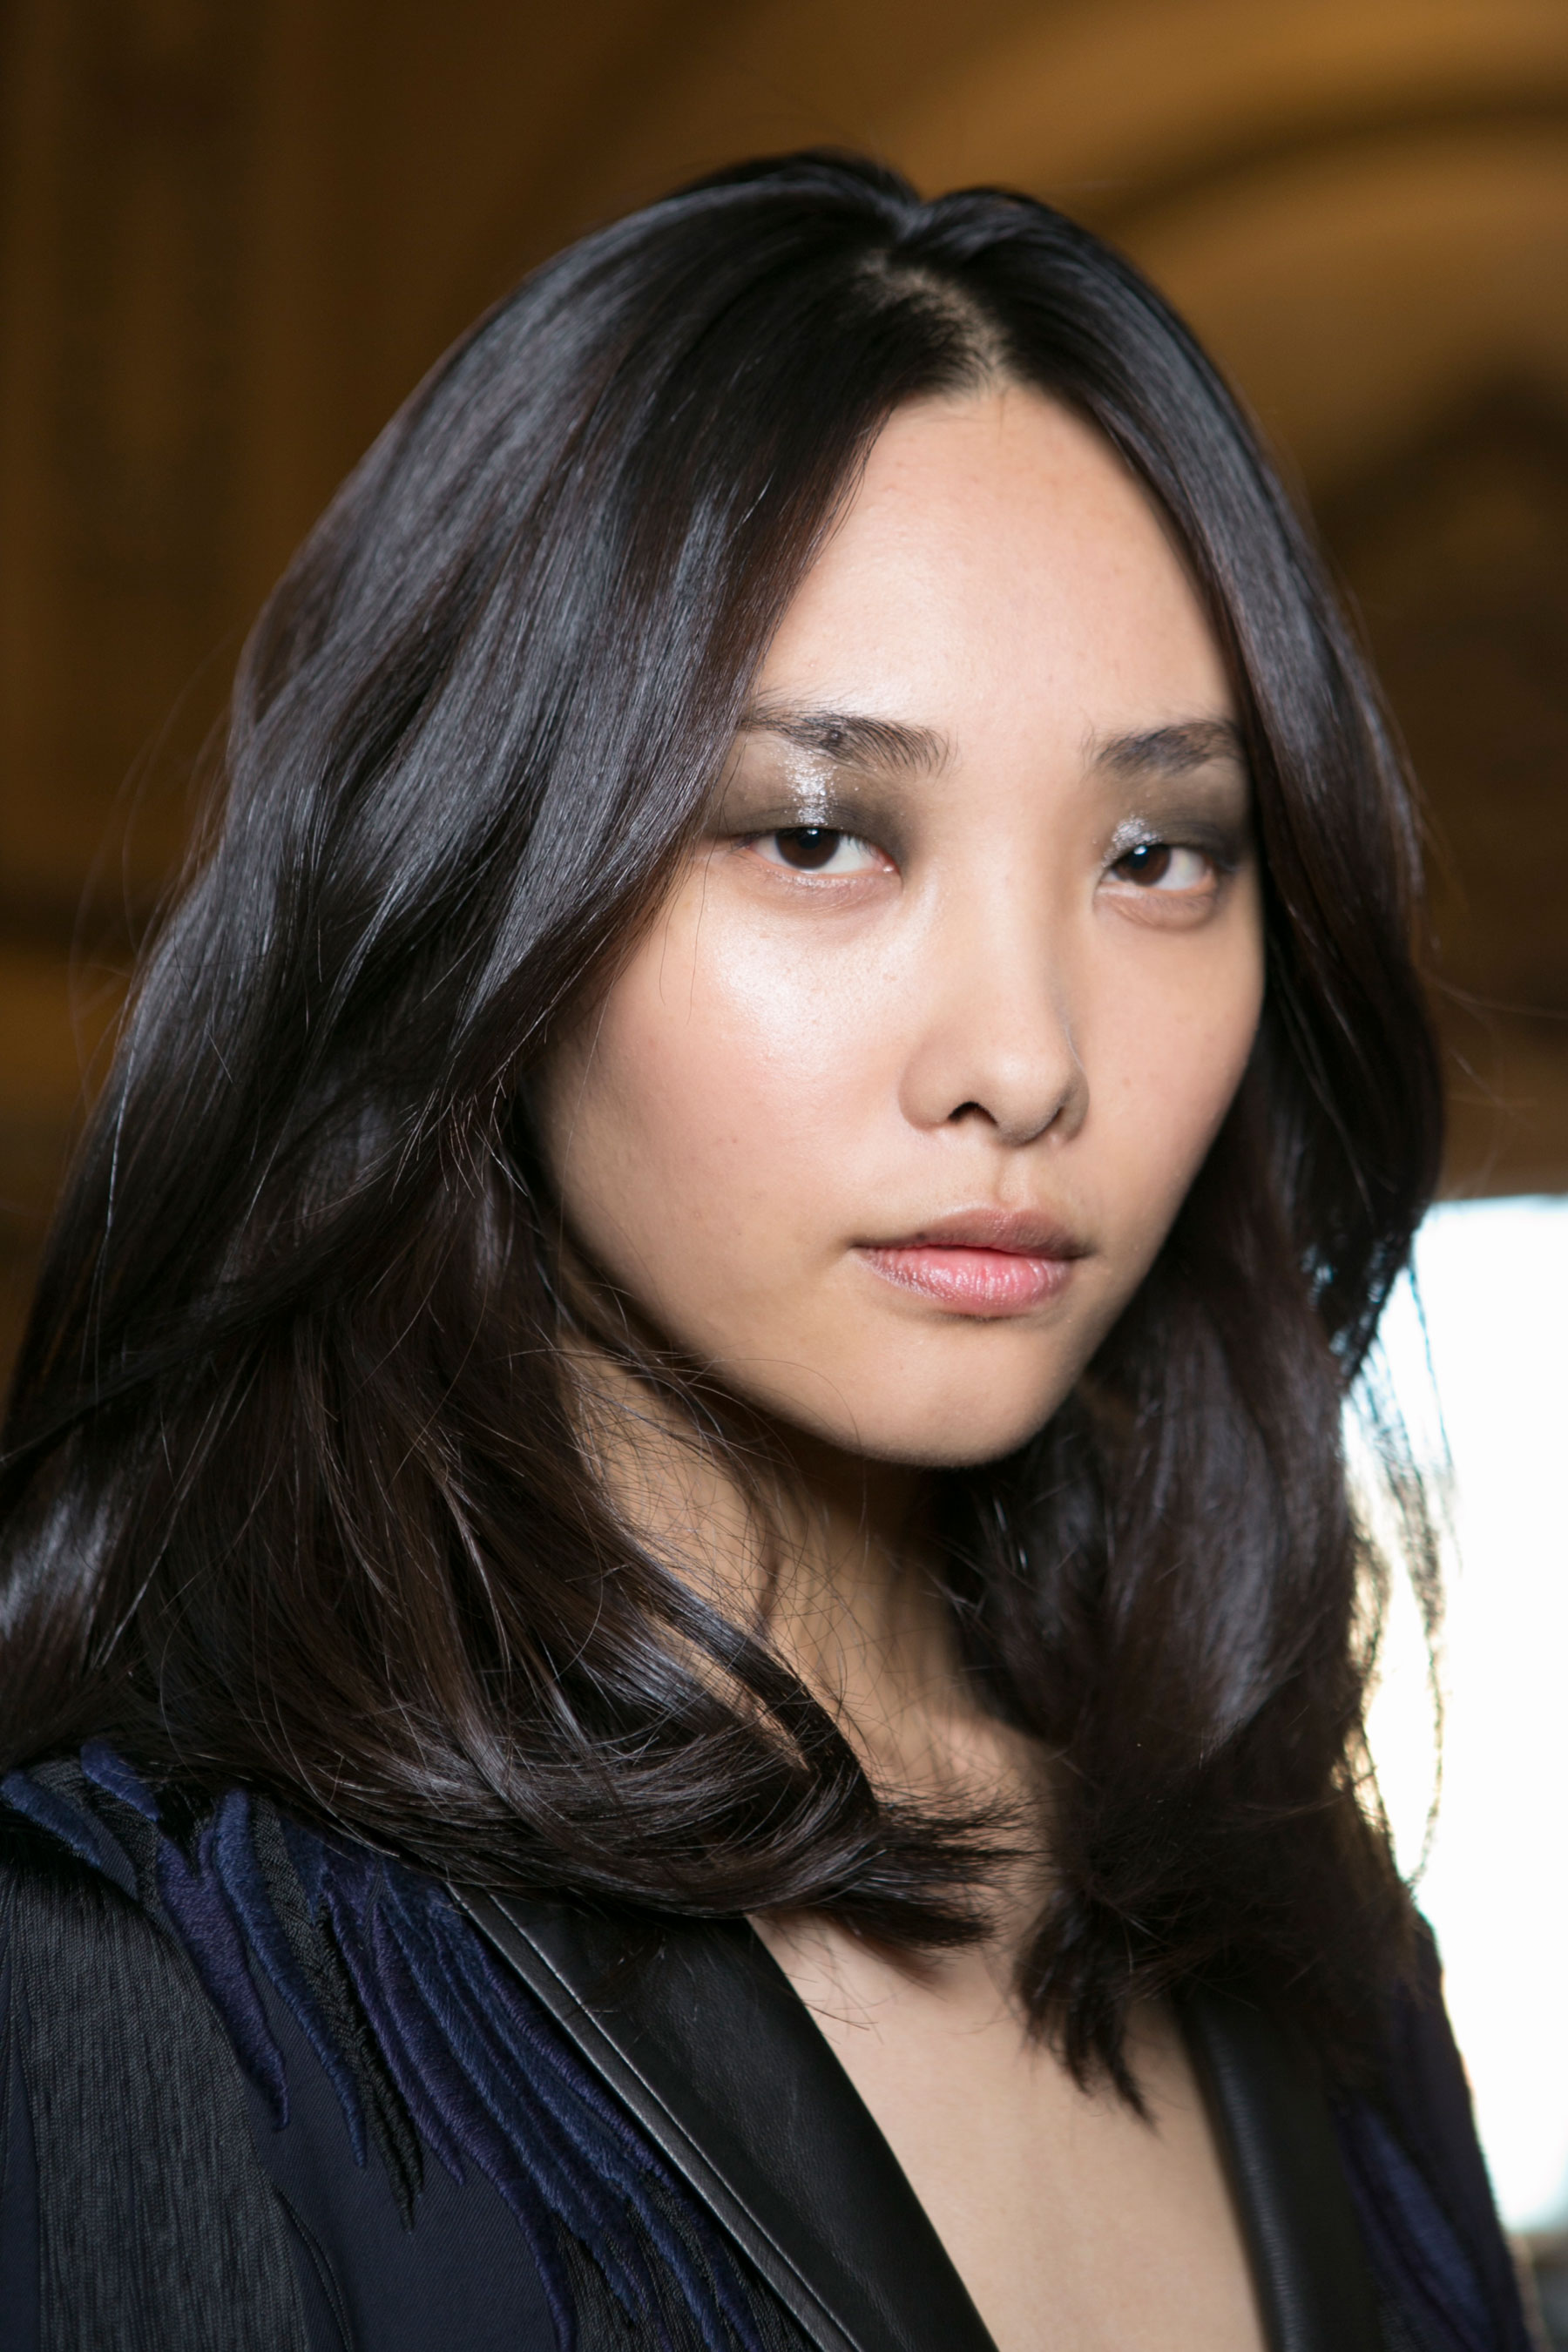 Barbara-Bui-spring-2016-beauty-fashion-show-the-impression-34